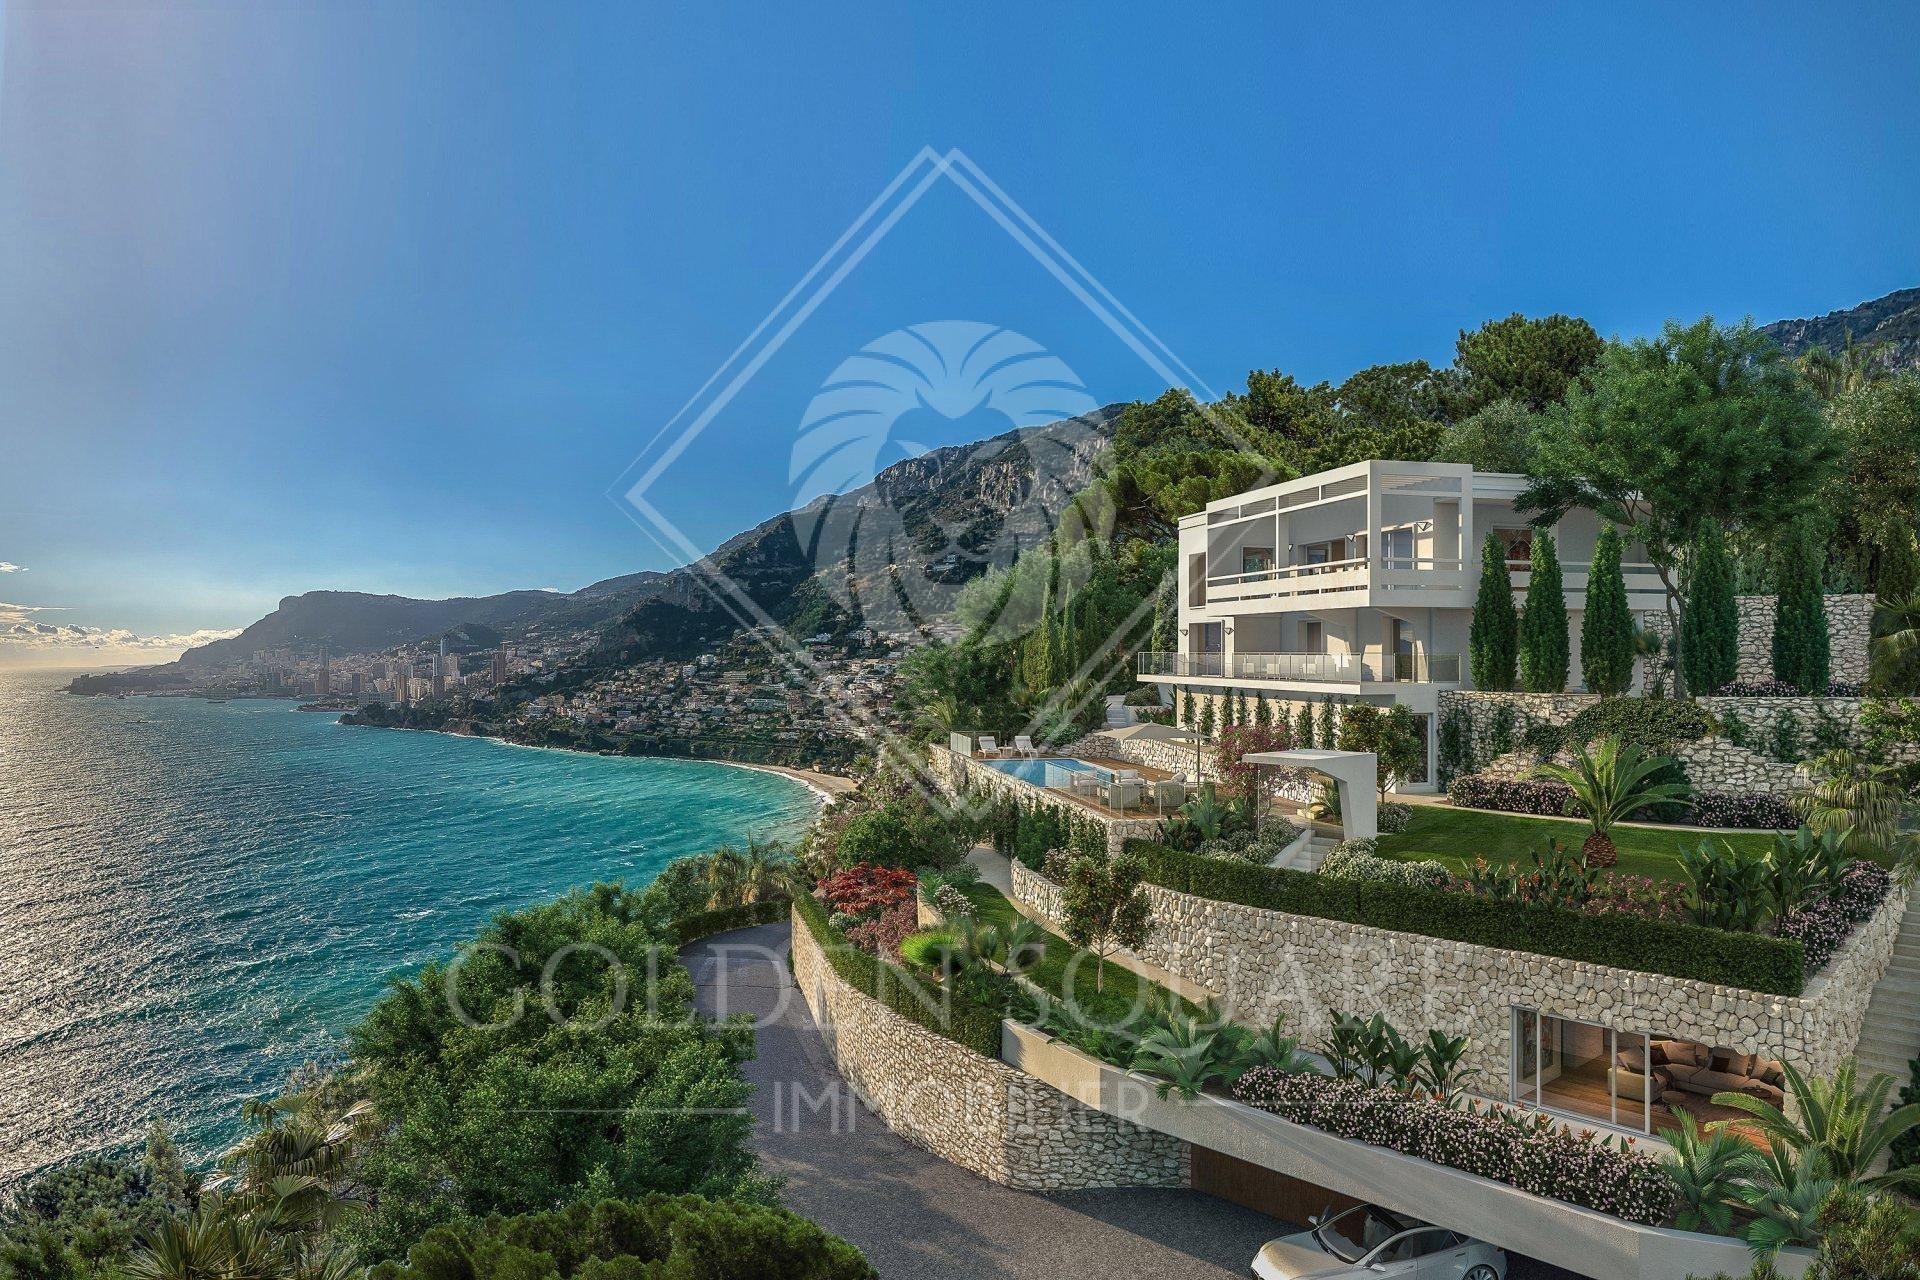 Villa in Roquebrune-Cap-Martin, Provence-Alpes-Côte d'Azur, France 1 - 10905047